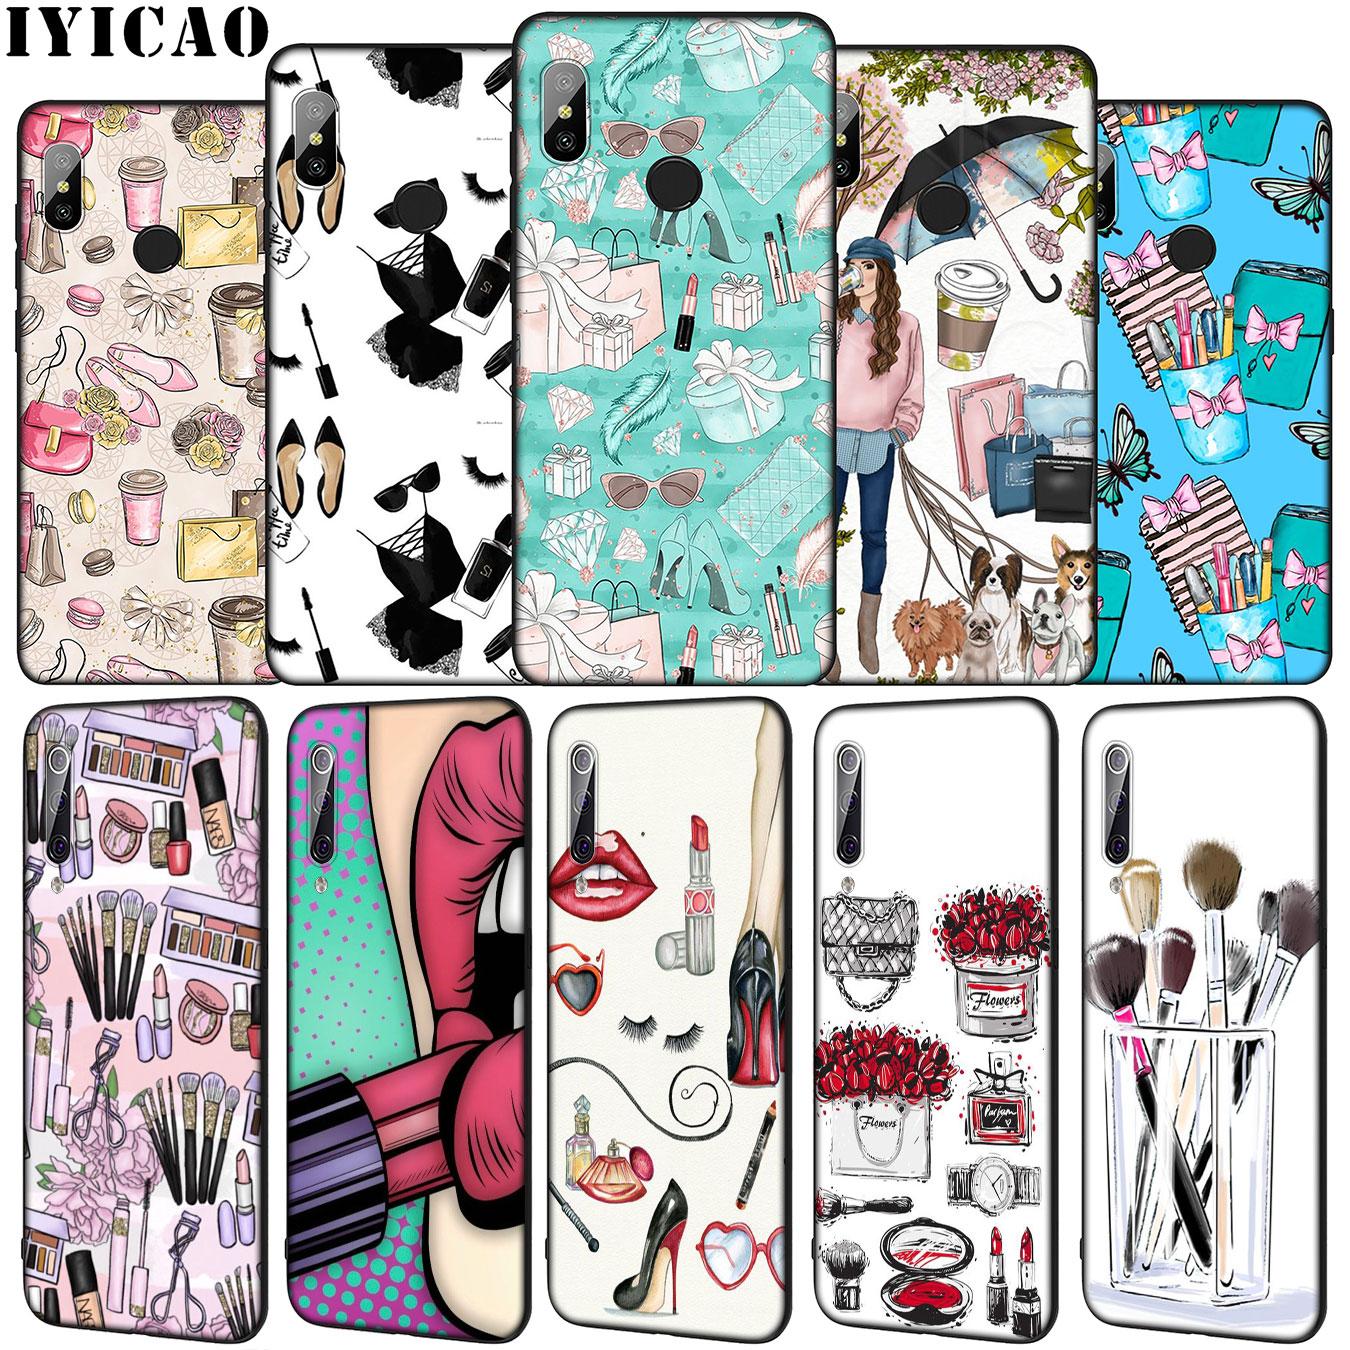 IYICAO labial de maquillaje Perfume de silicona suave funda de teléfono para Xiaomi mi 10 9 9T A3 Pro 8 SE A2 Lite A1 CC9 CC9E 6 teléfono móvil f1 mi 10